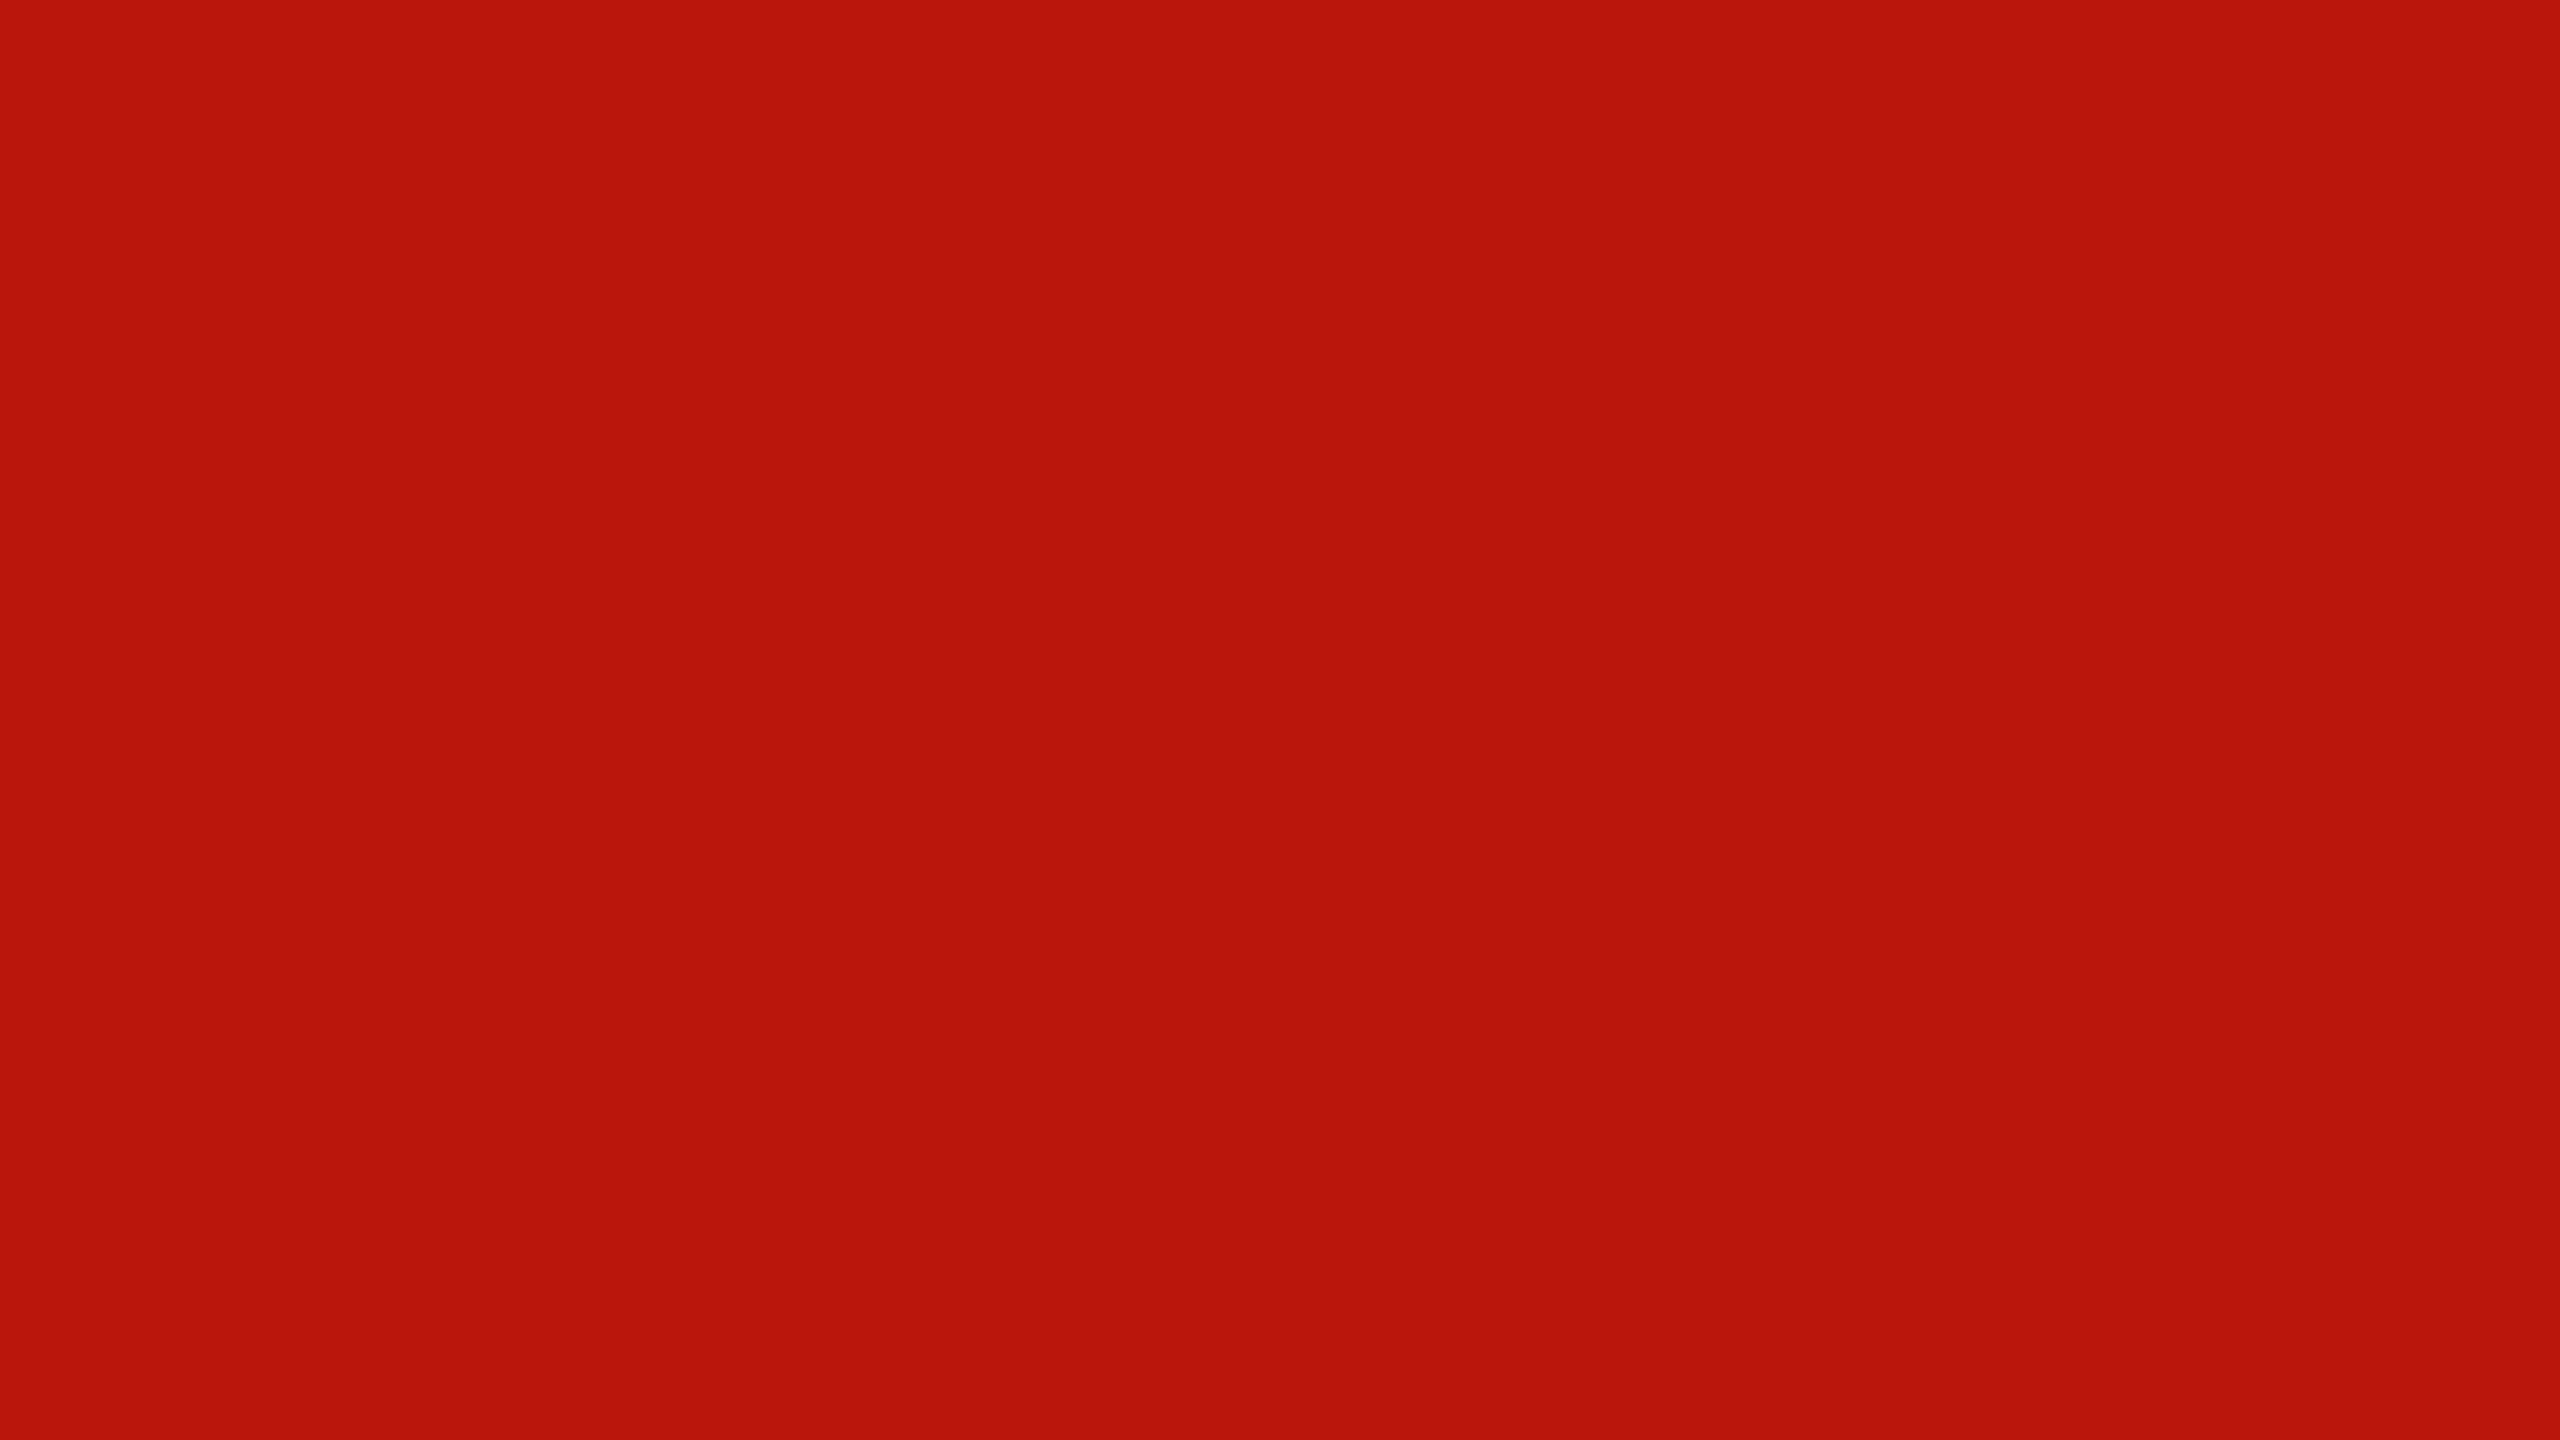 2560x1440 International Orange Engineering Solid Color Background